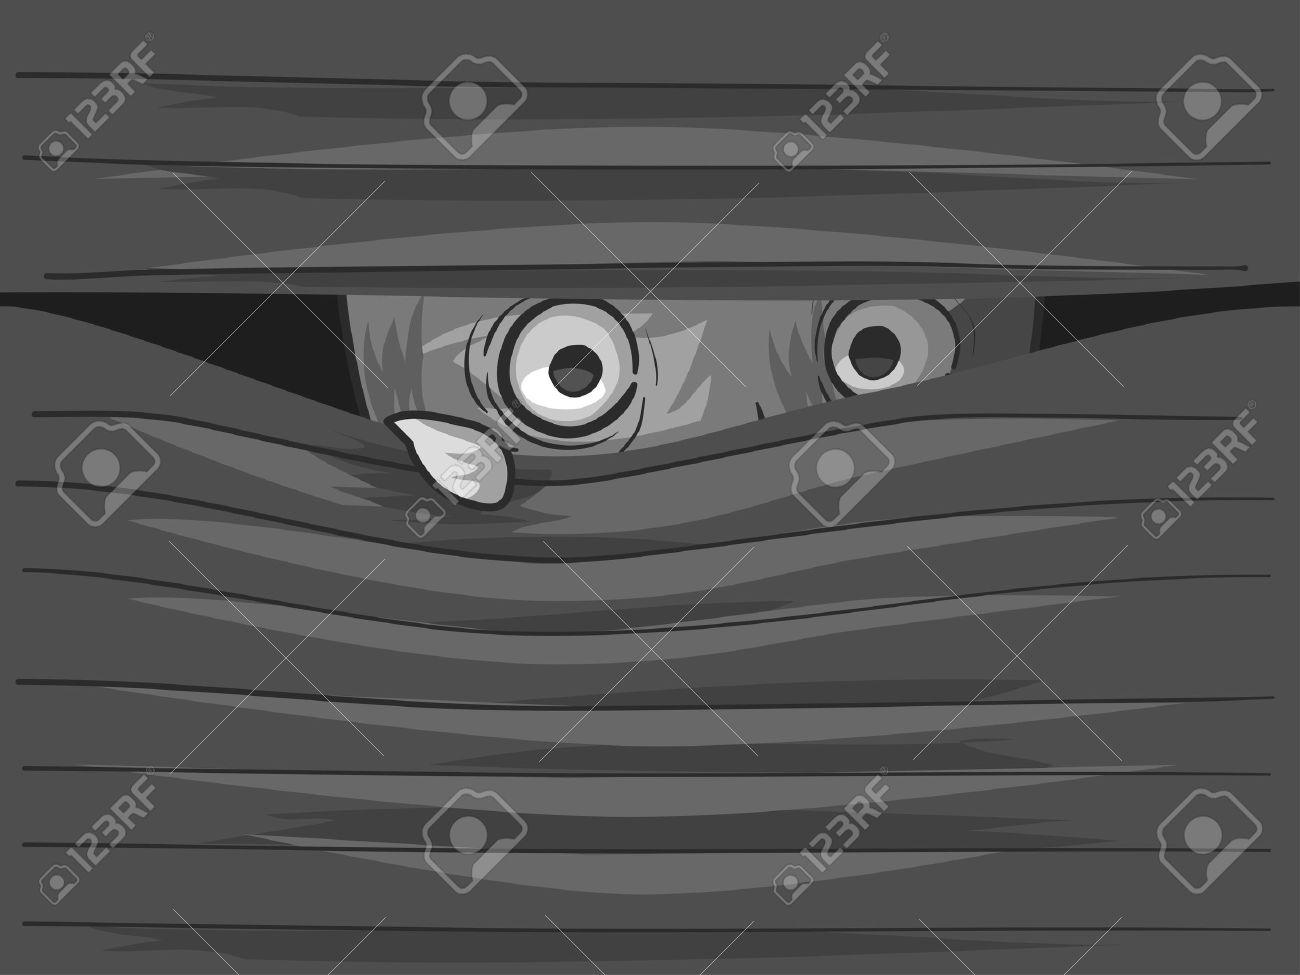 Illustration of an Agoraphobic Man Peeking from Behind His Venetian Blinds - 55880130